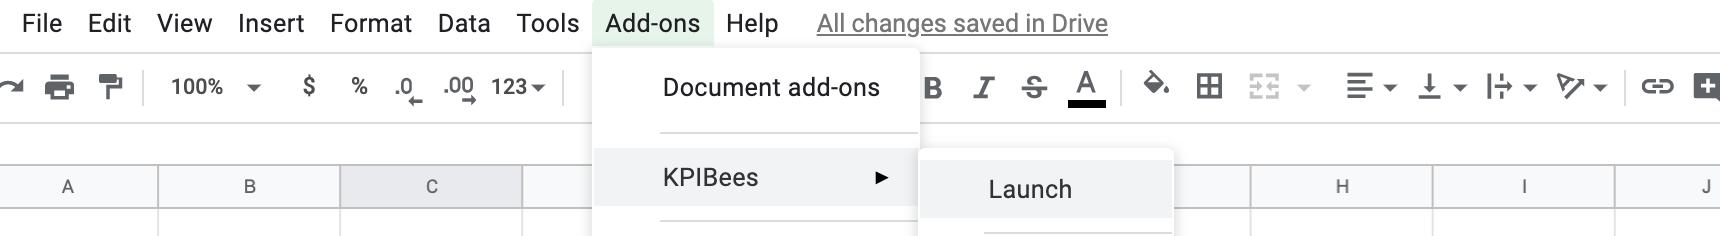 Google Sheet Add-on location toolbar.